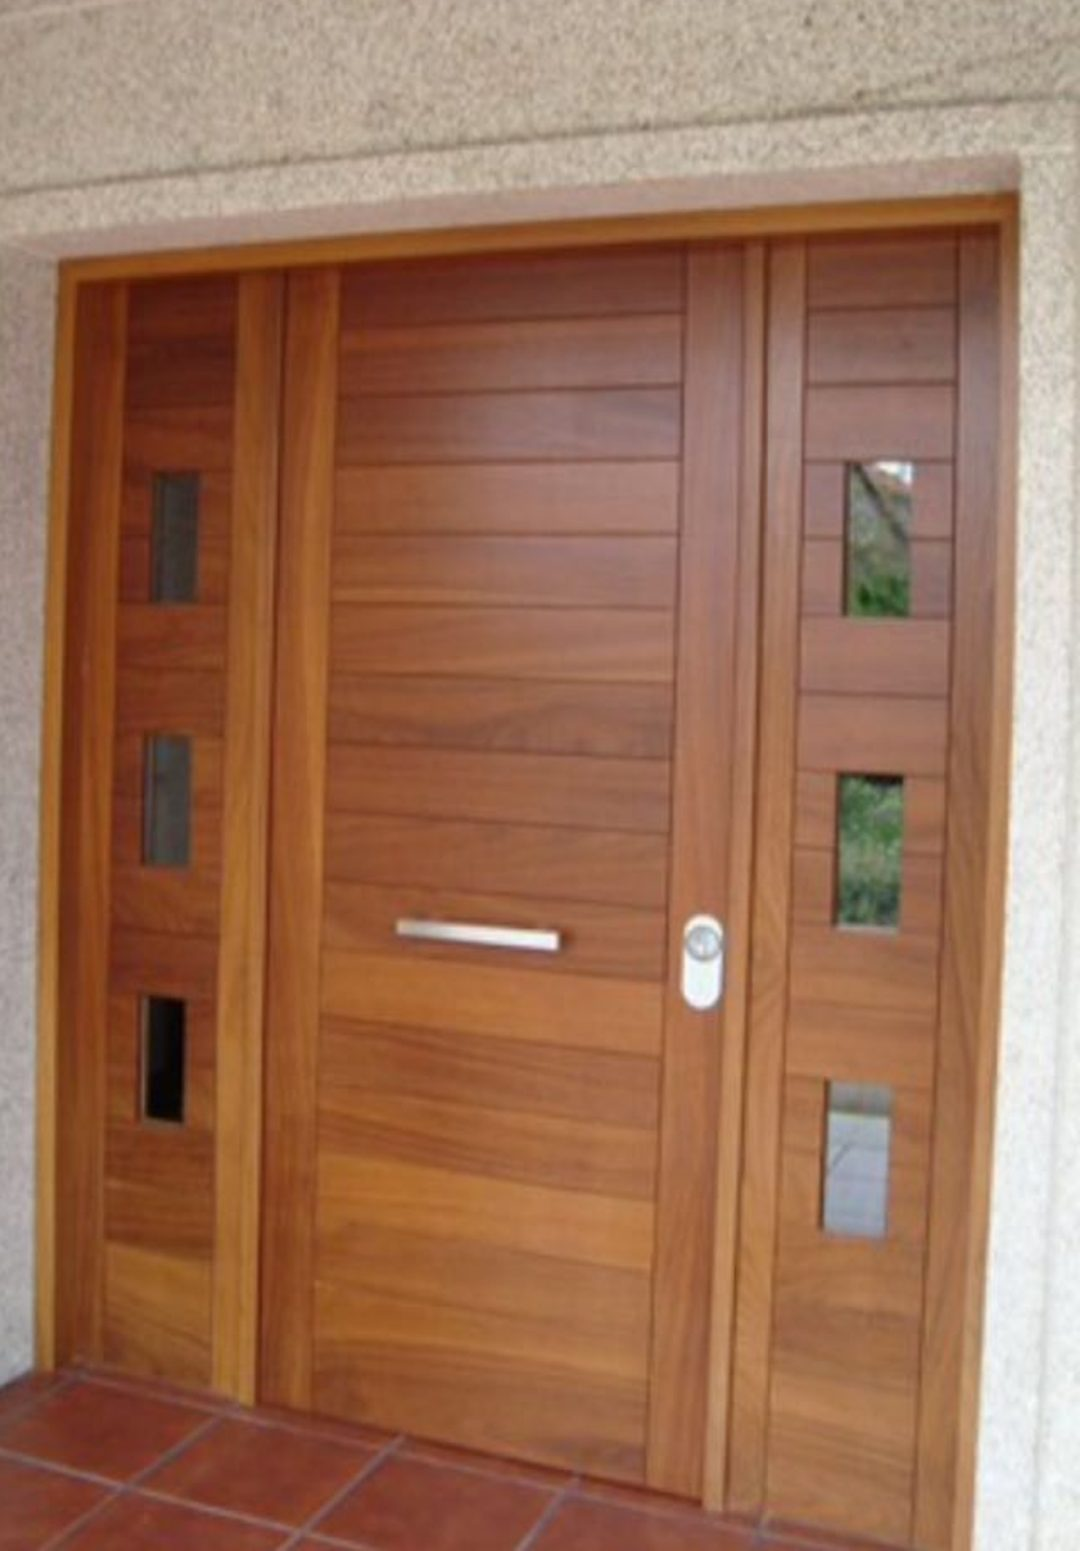 Puerta de entrada madera a medida puertas lis - Puertas de entrada madera ...